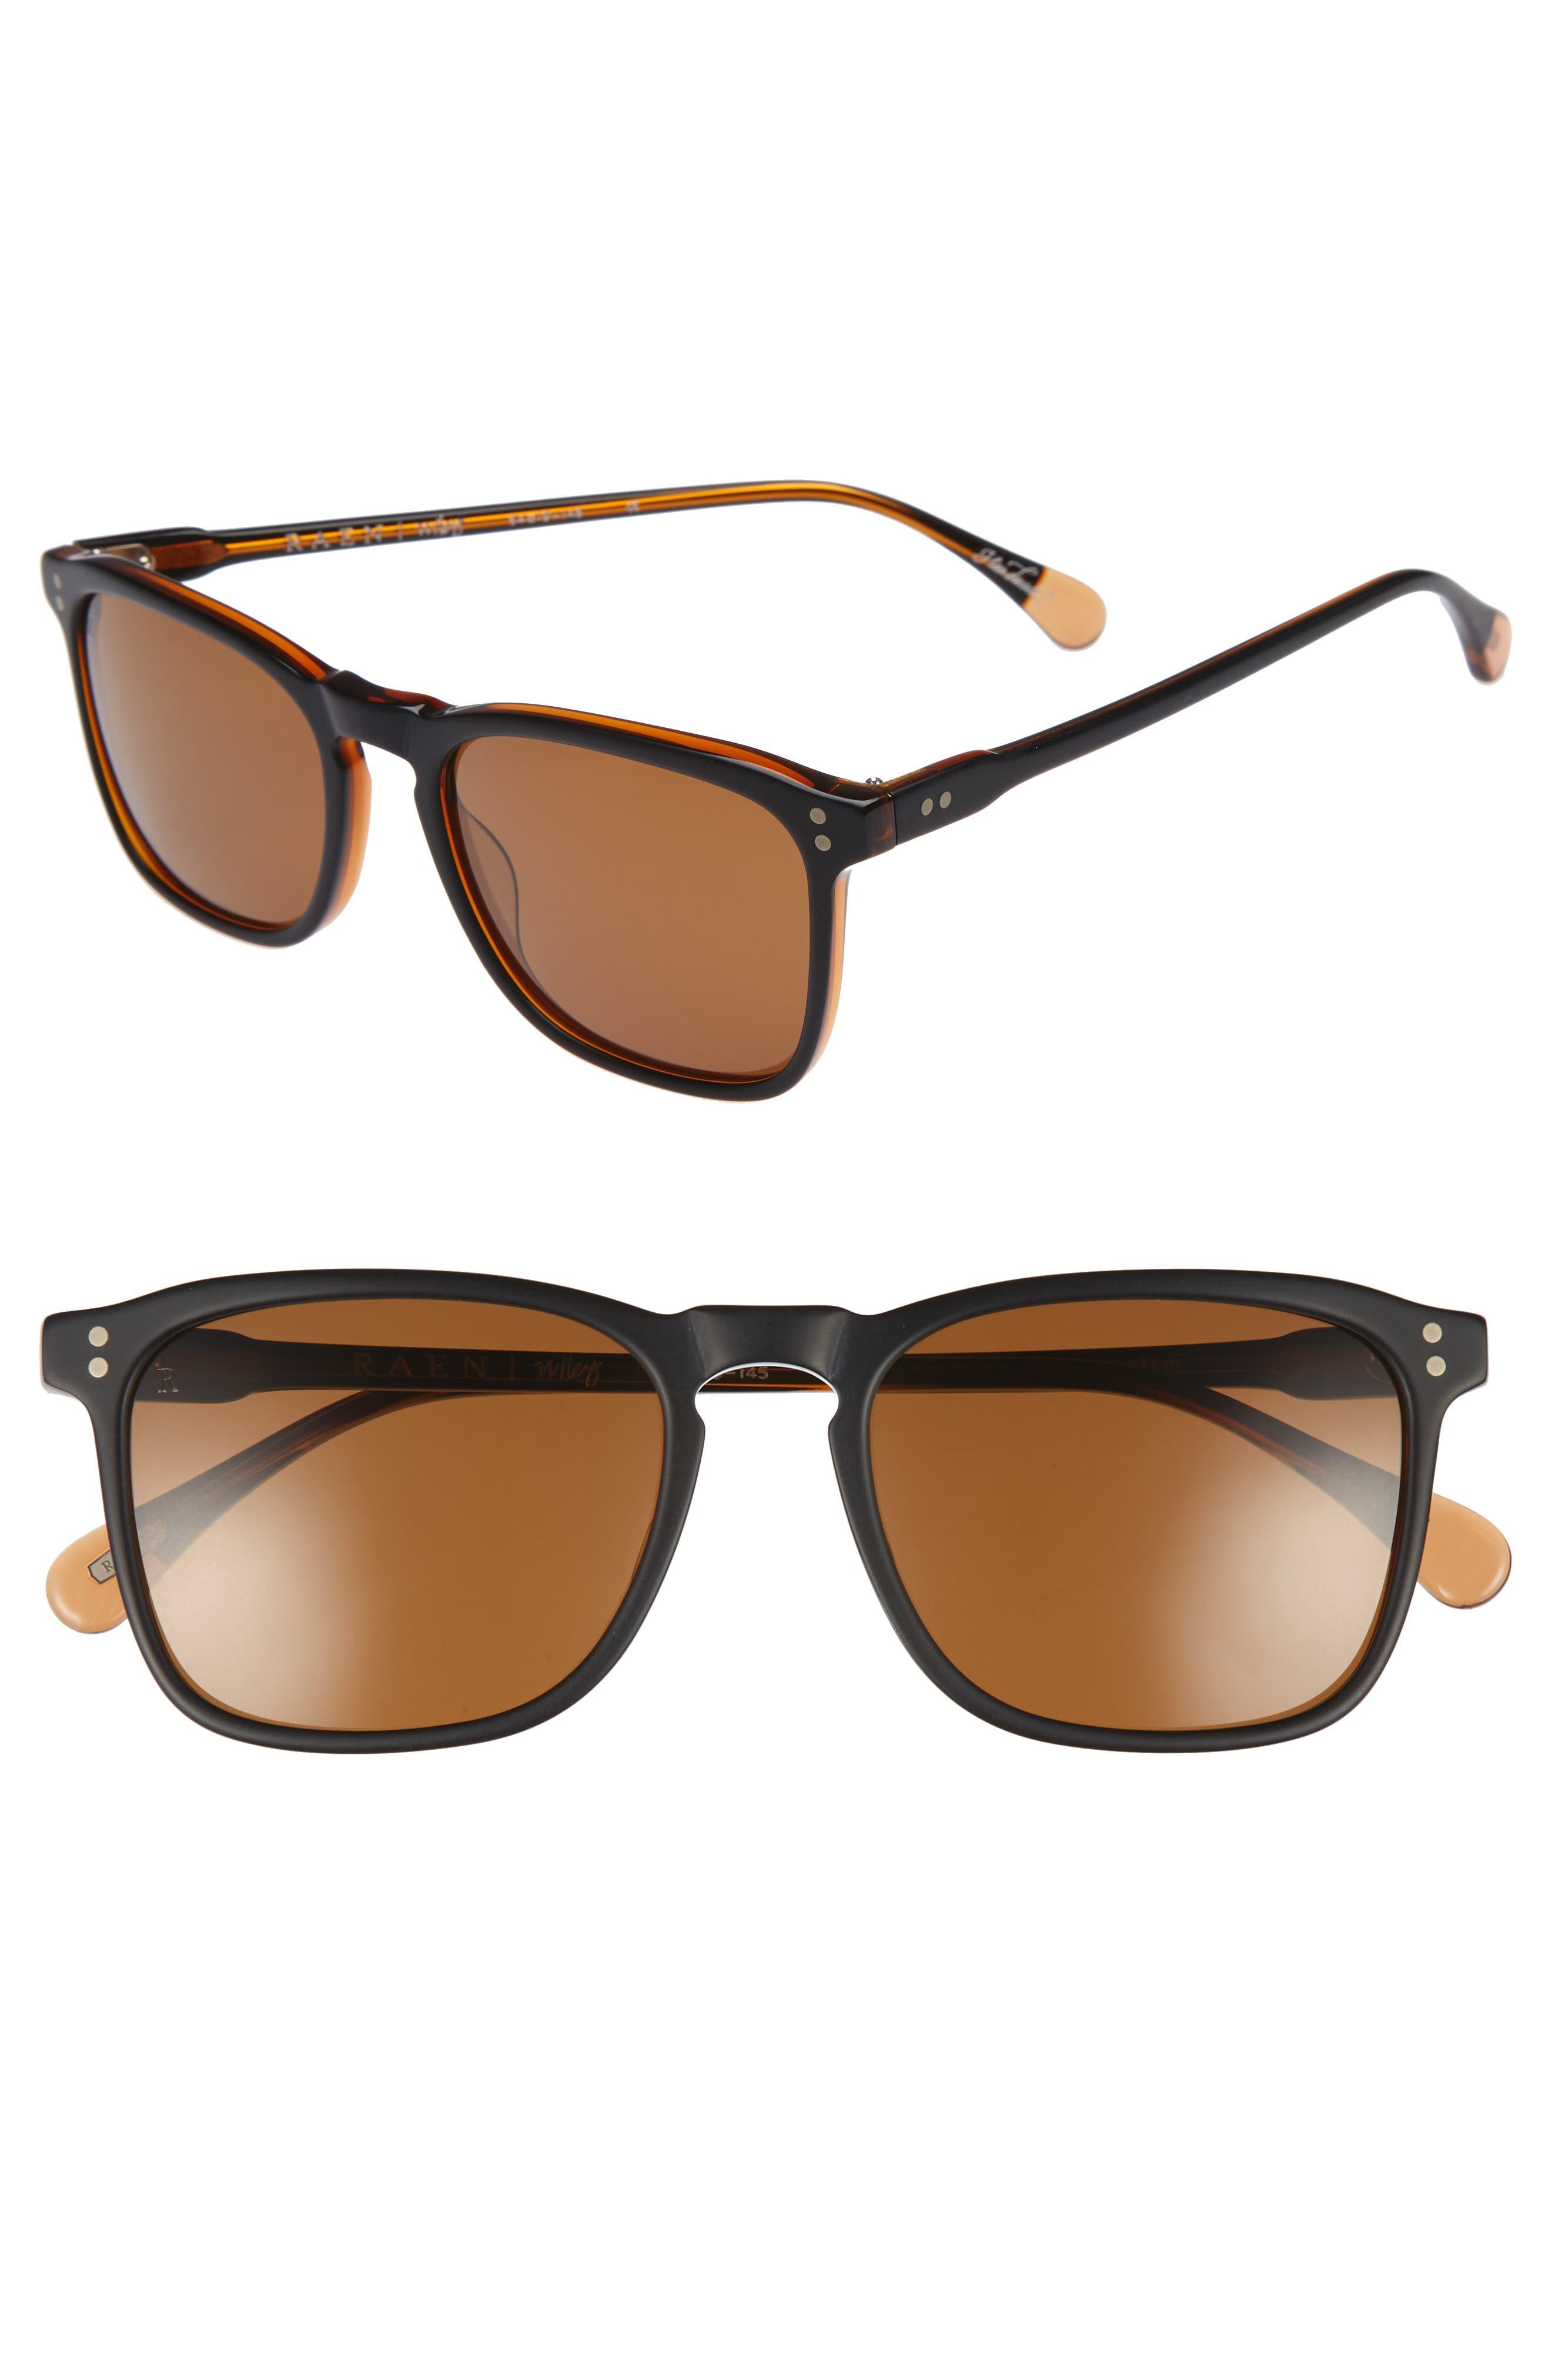 Wiley 54mm Polarized Sunglasses,                         Main,                         color, 004